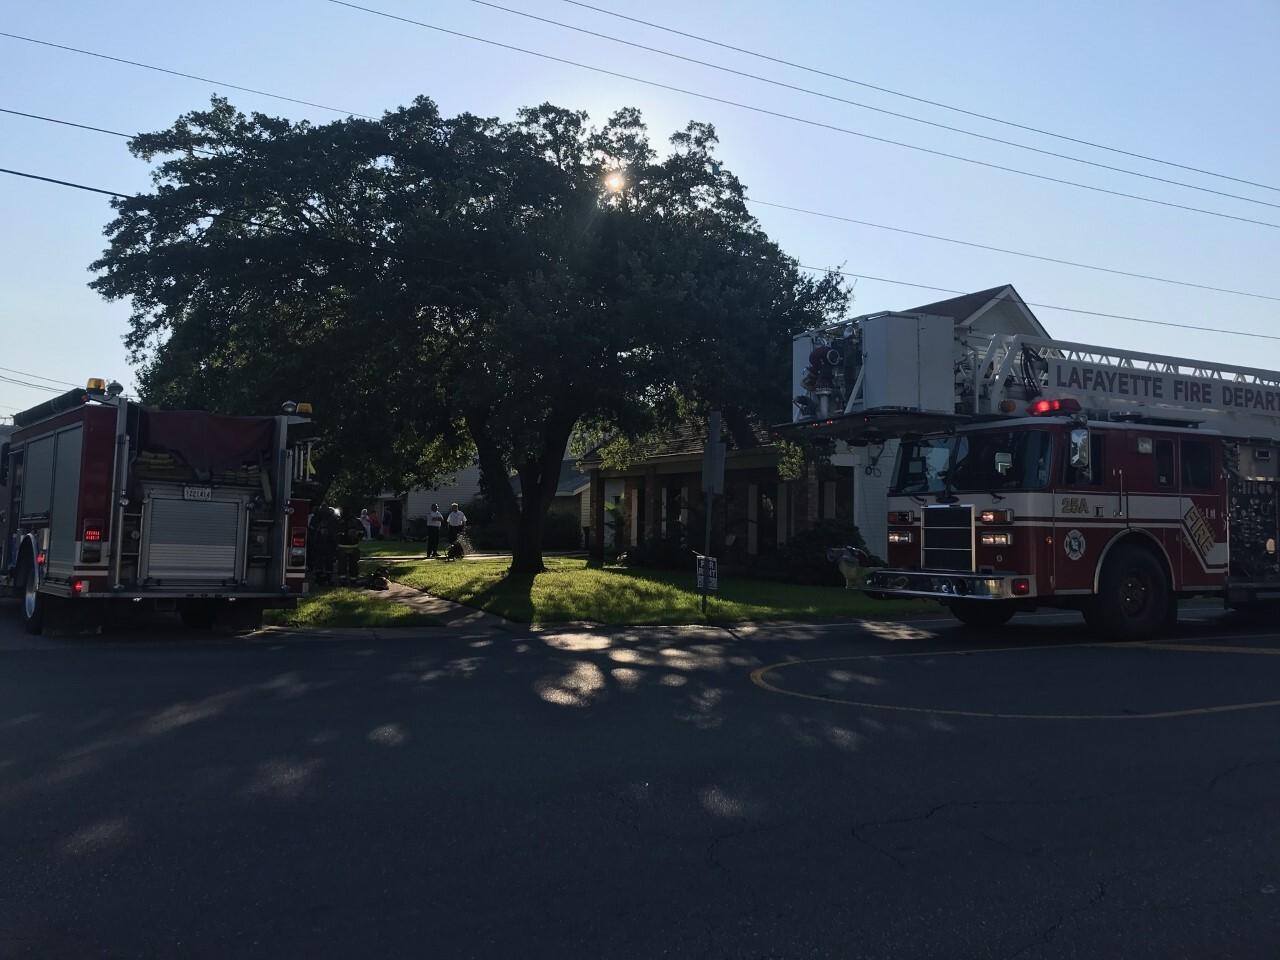 Lafayette firefighters respond to house fire on bridgeway for Lafayette cds 30